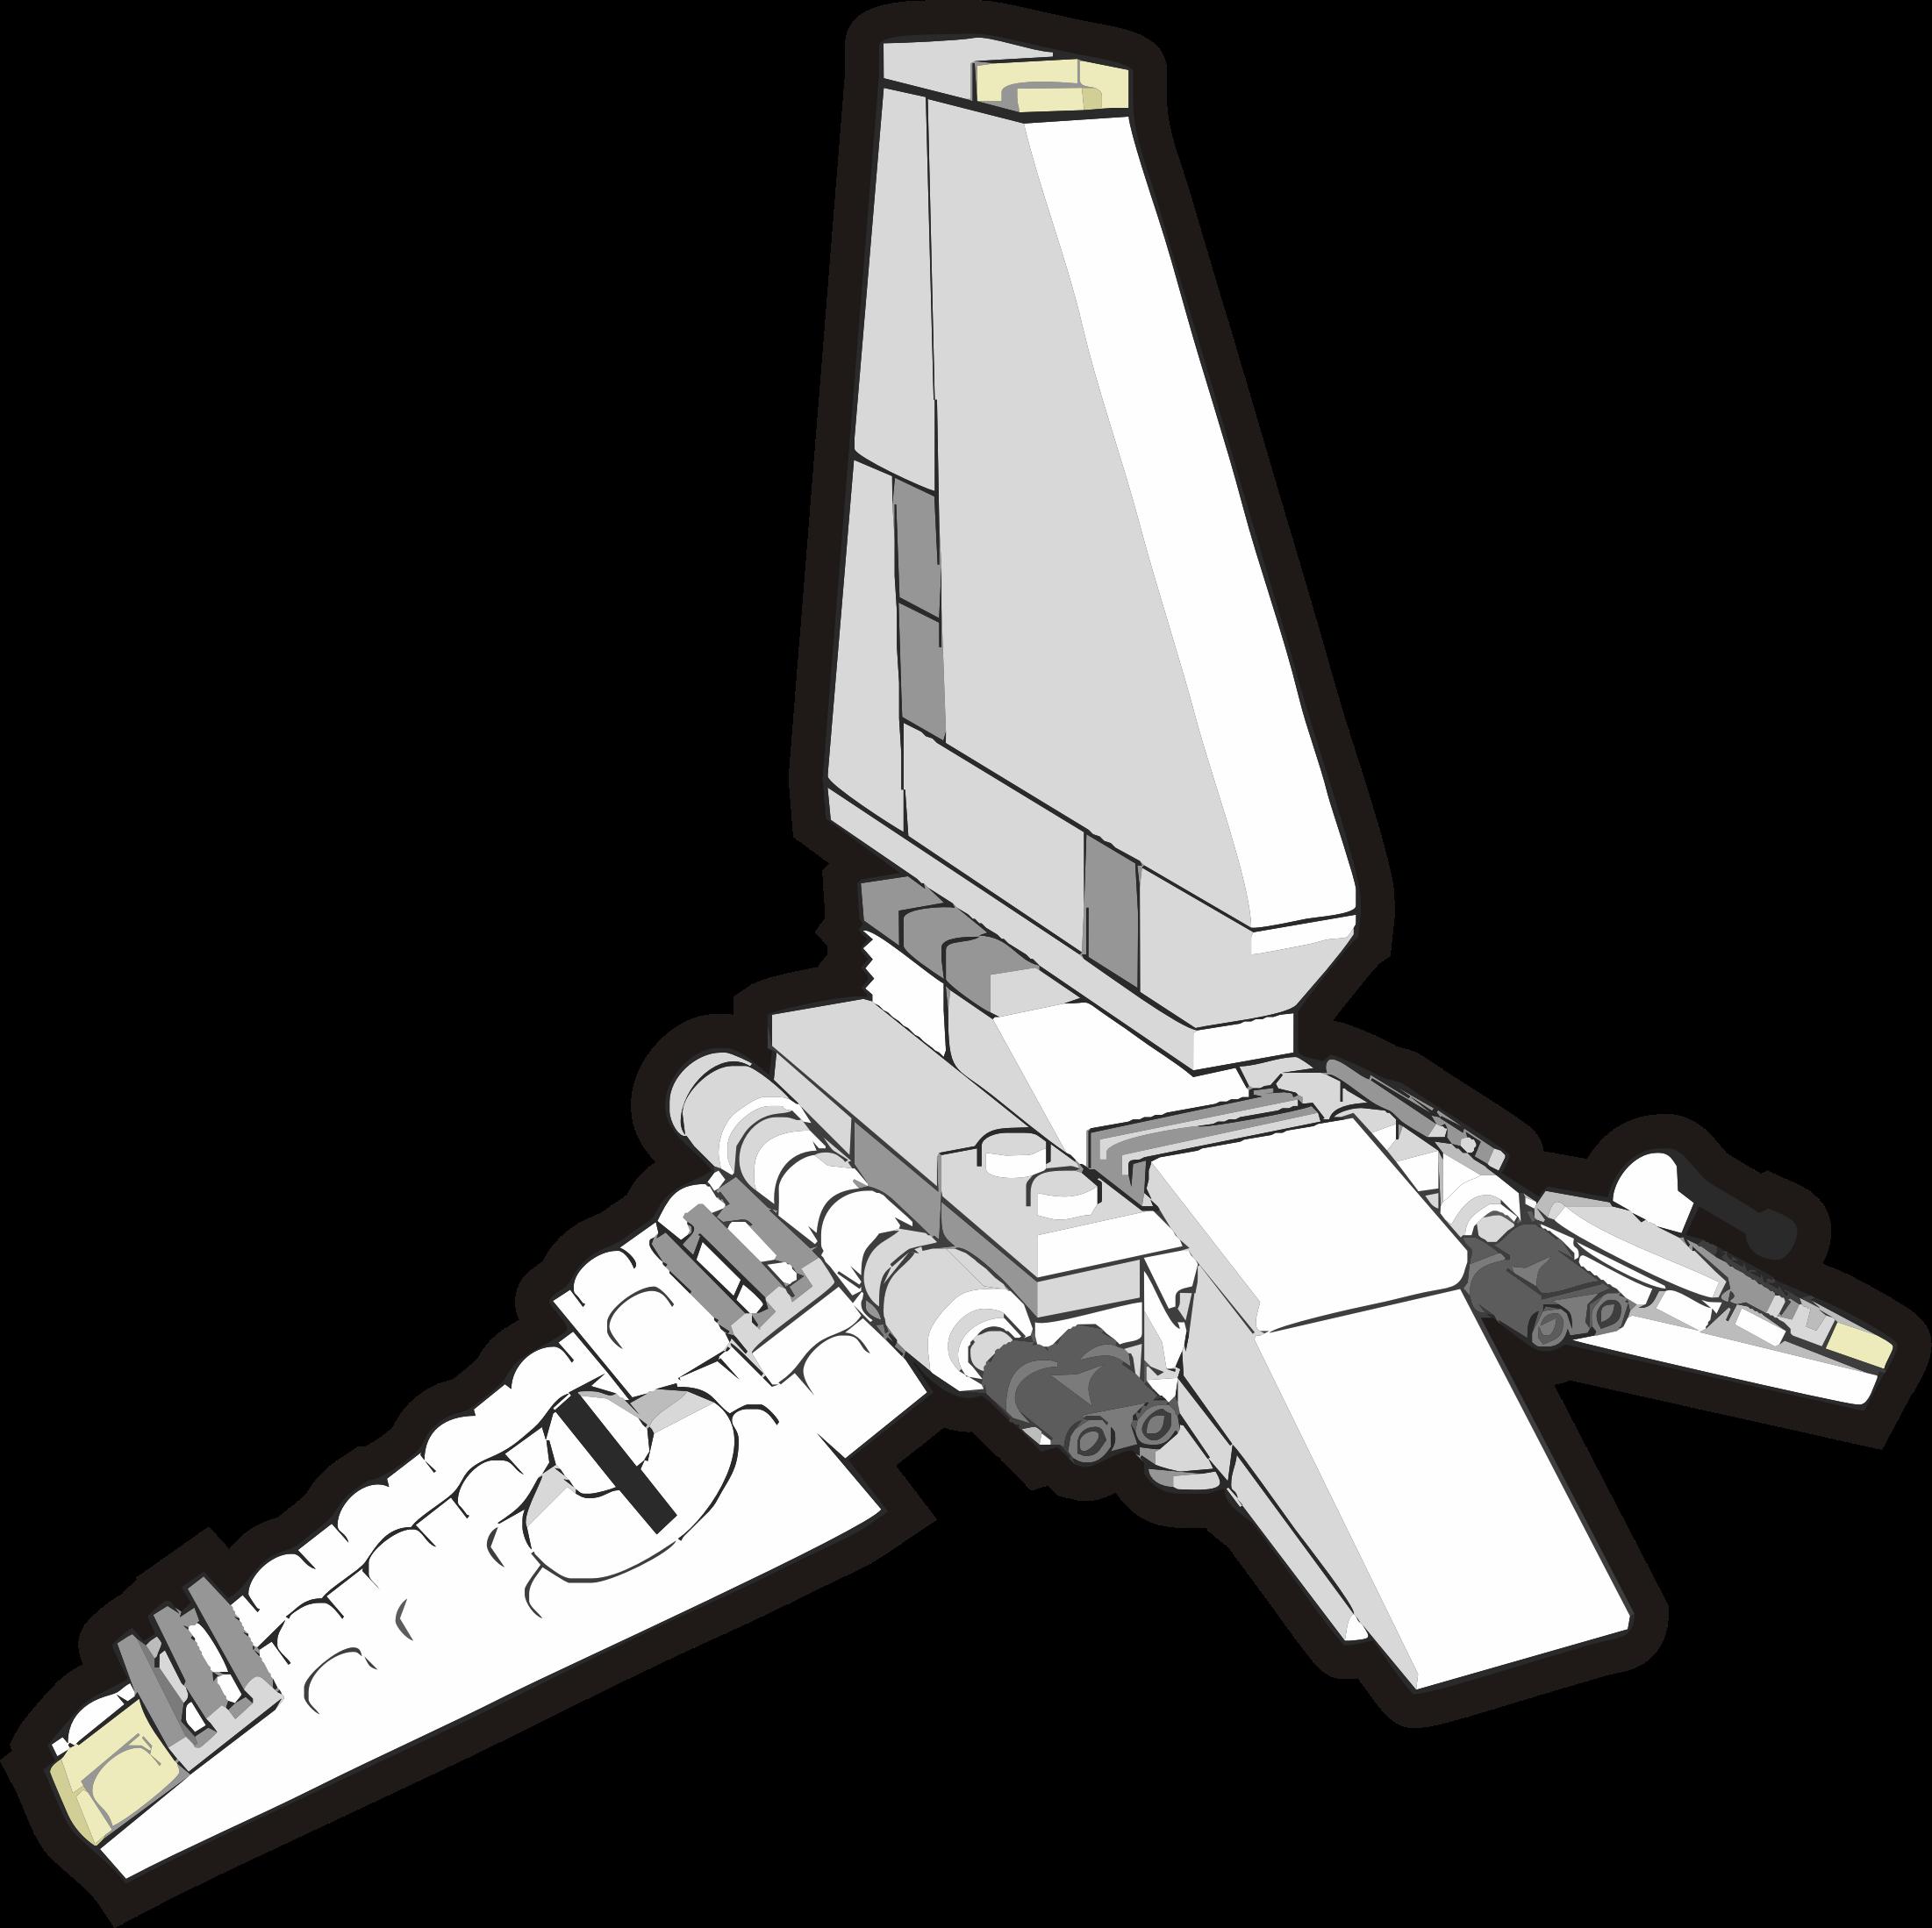 2202x2198 Star Destroyer Svg Stock Transparent Background